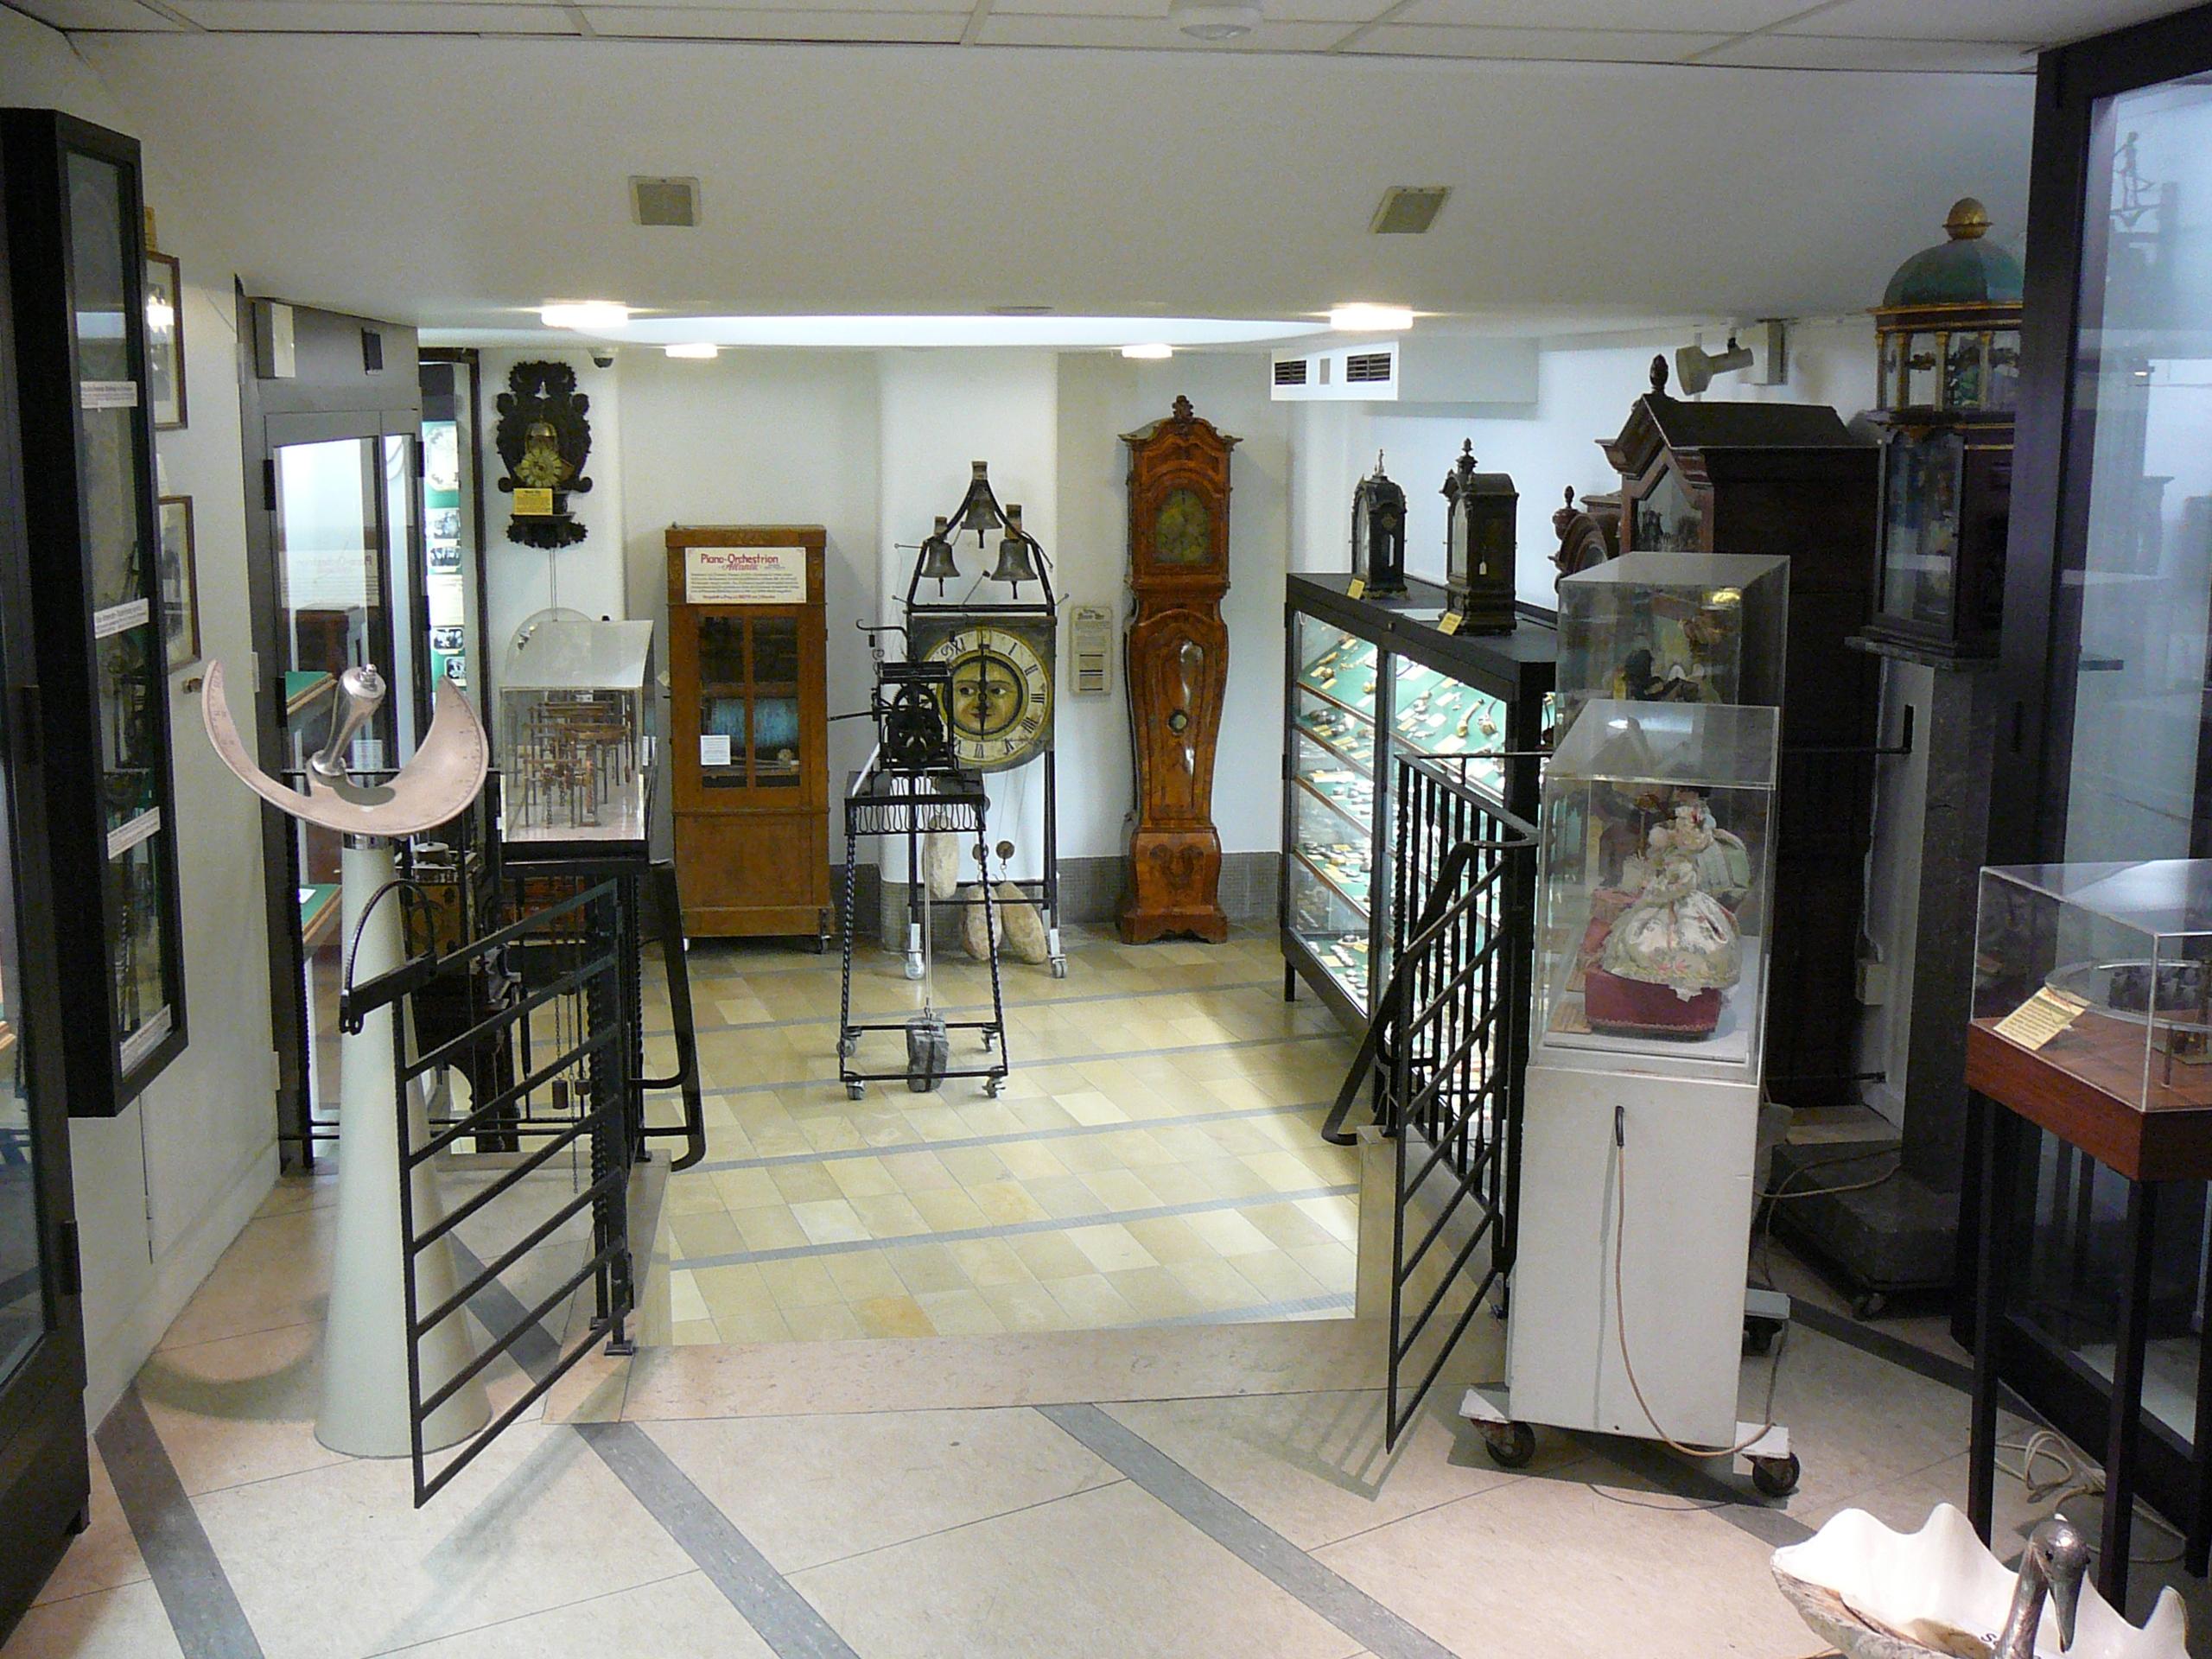 Wuppertaler Uhrenmuseum, Klokkenspel en ereldklokken, 8 september 2012. Foto met dank aan Atamari, CC BY-SA 3.0